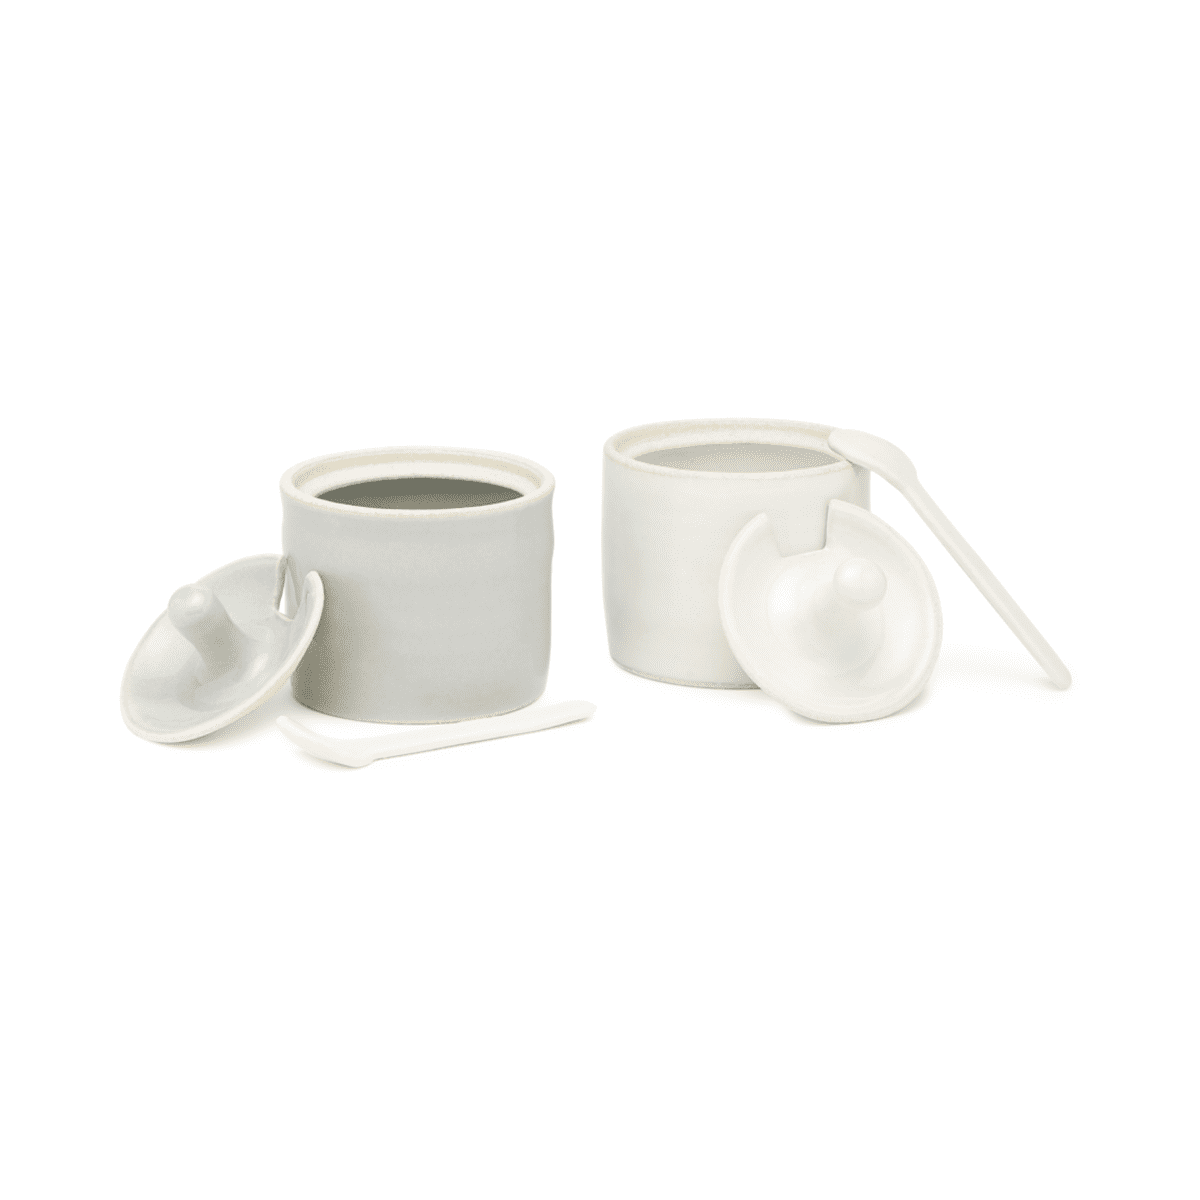 Sheldon Ceramics Spice Jar Set